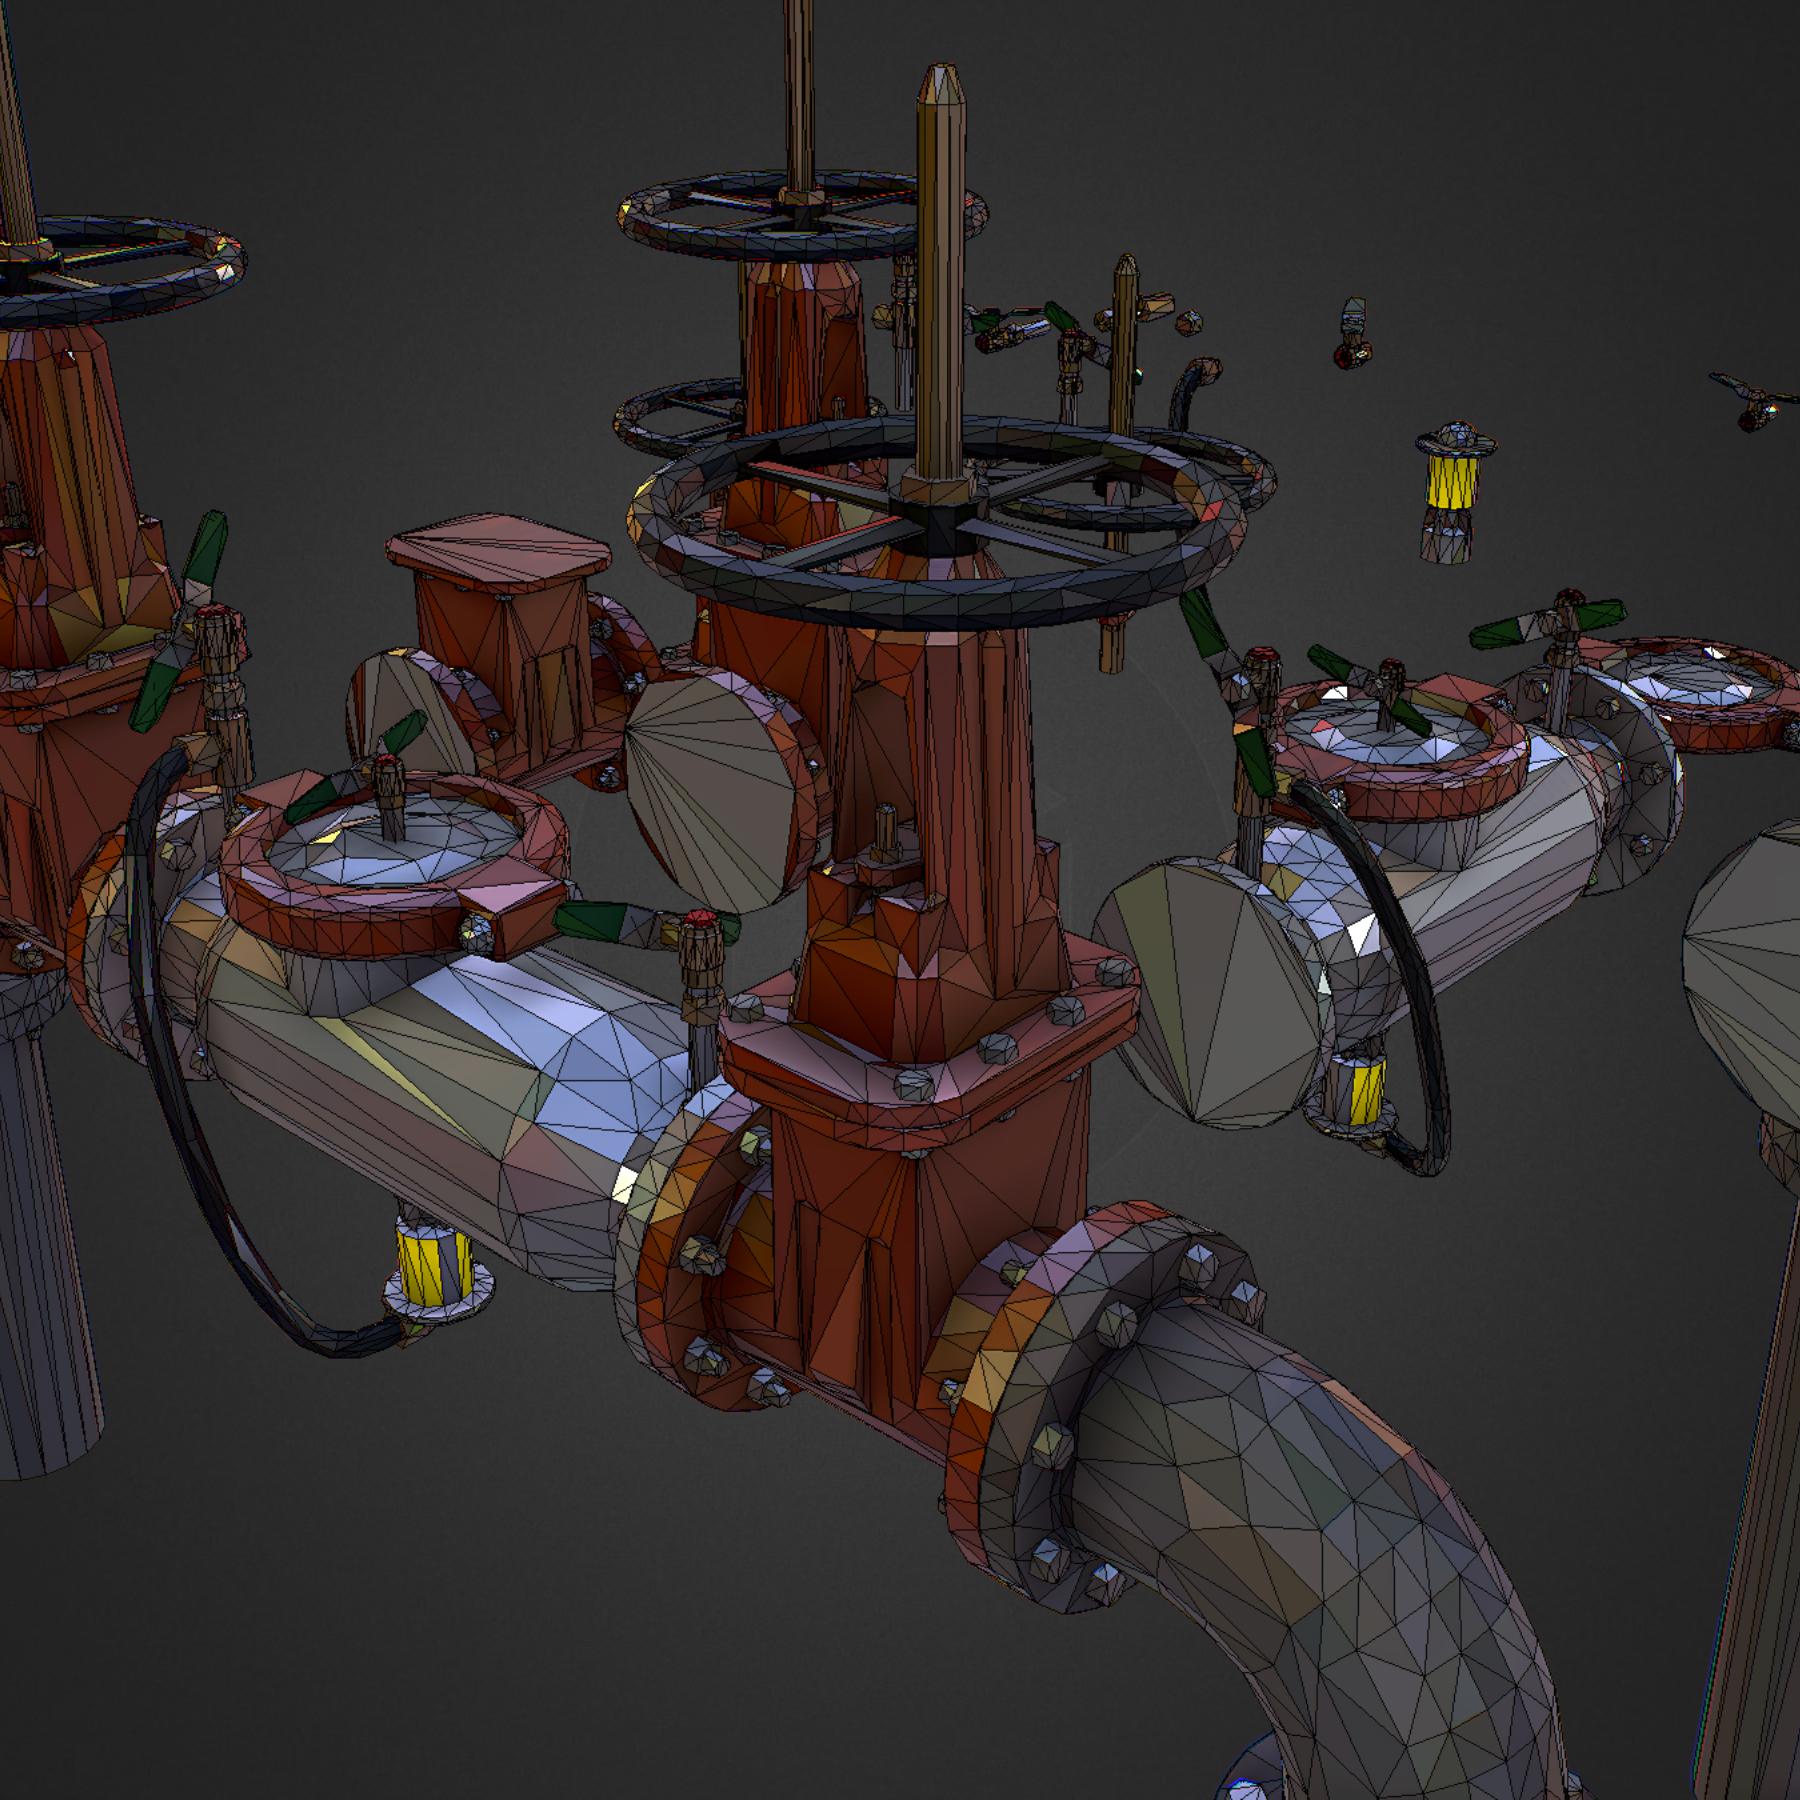 Low Poly ART Backflow Water Pipe Constructor 3d model max 3ds max plugin fbx ma mb tga targa icb vda vst pix obj 272569